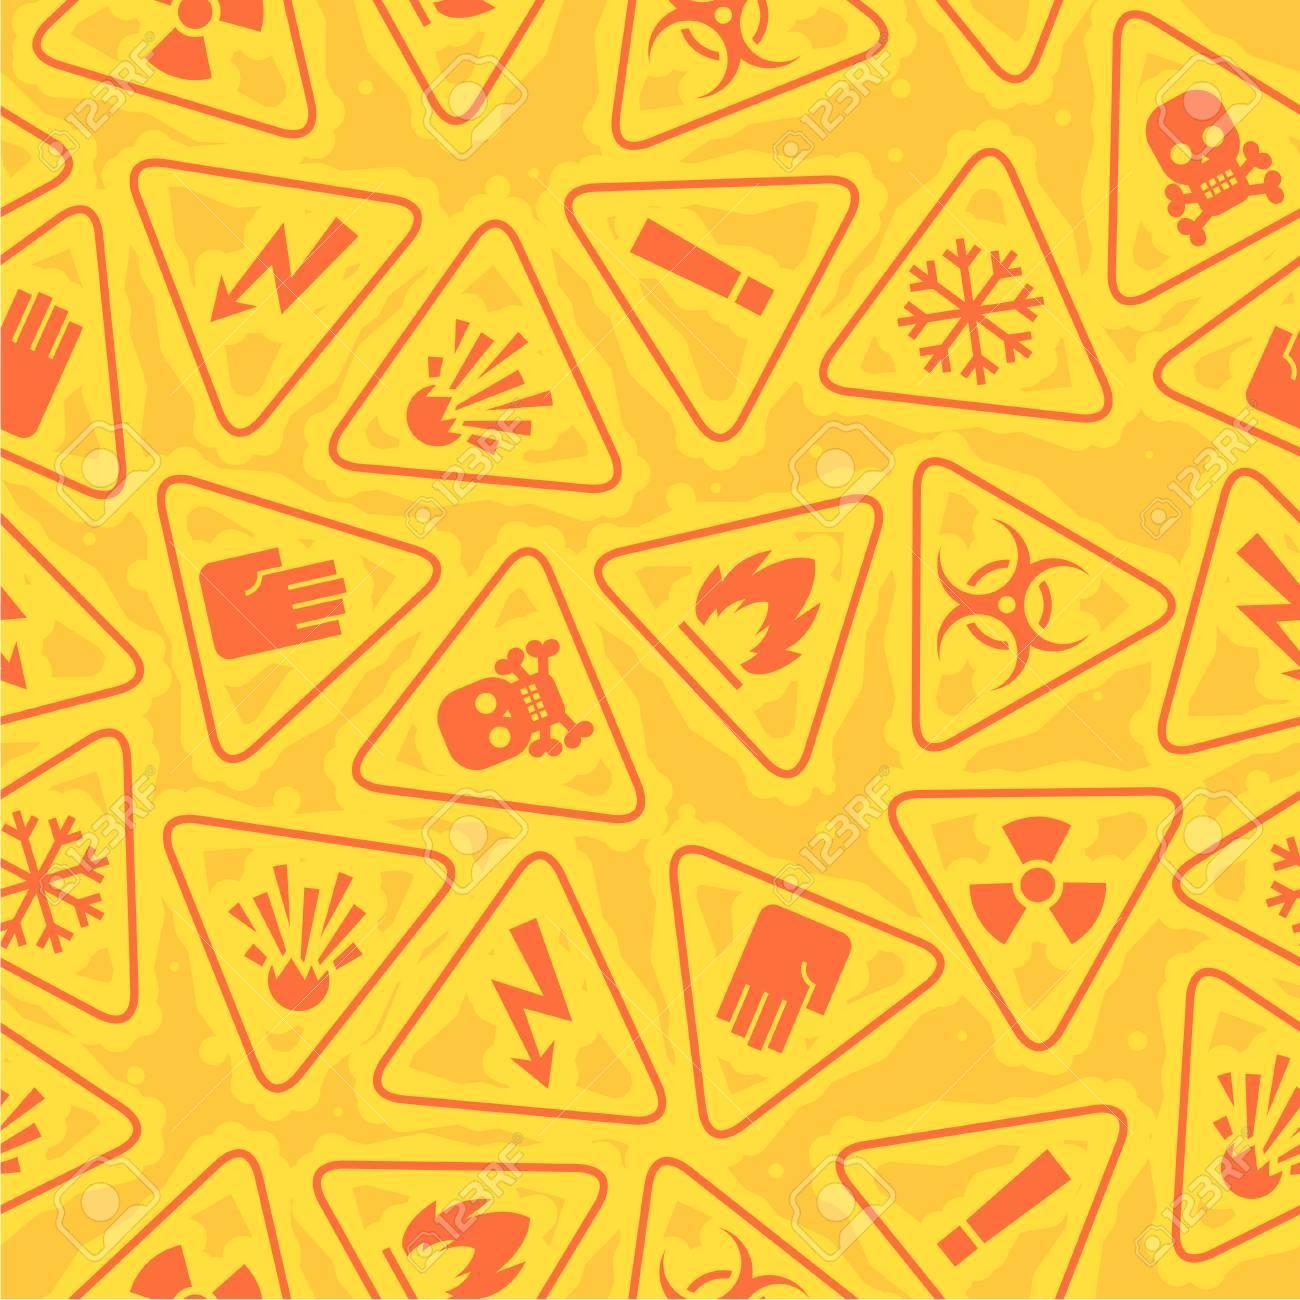 Pattern warning signs of danger Stock Vector - 25122956